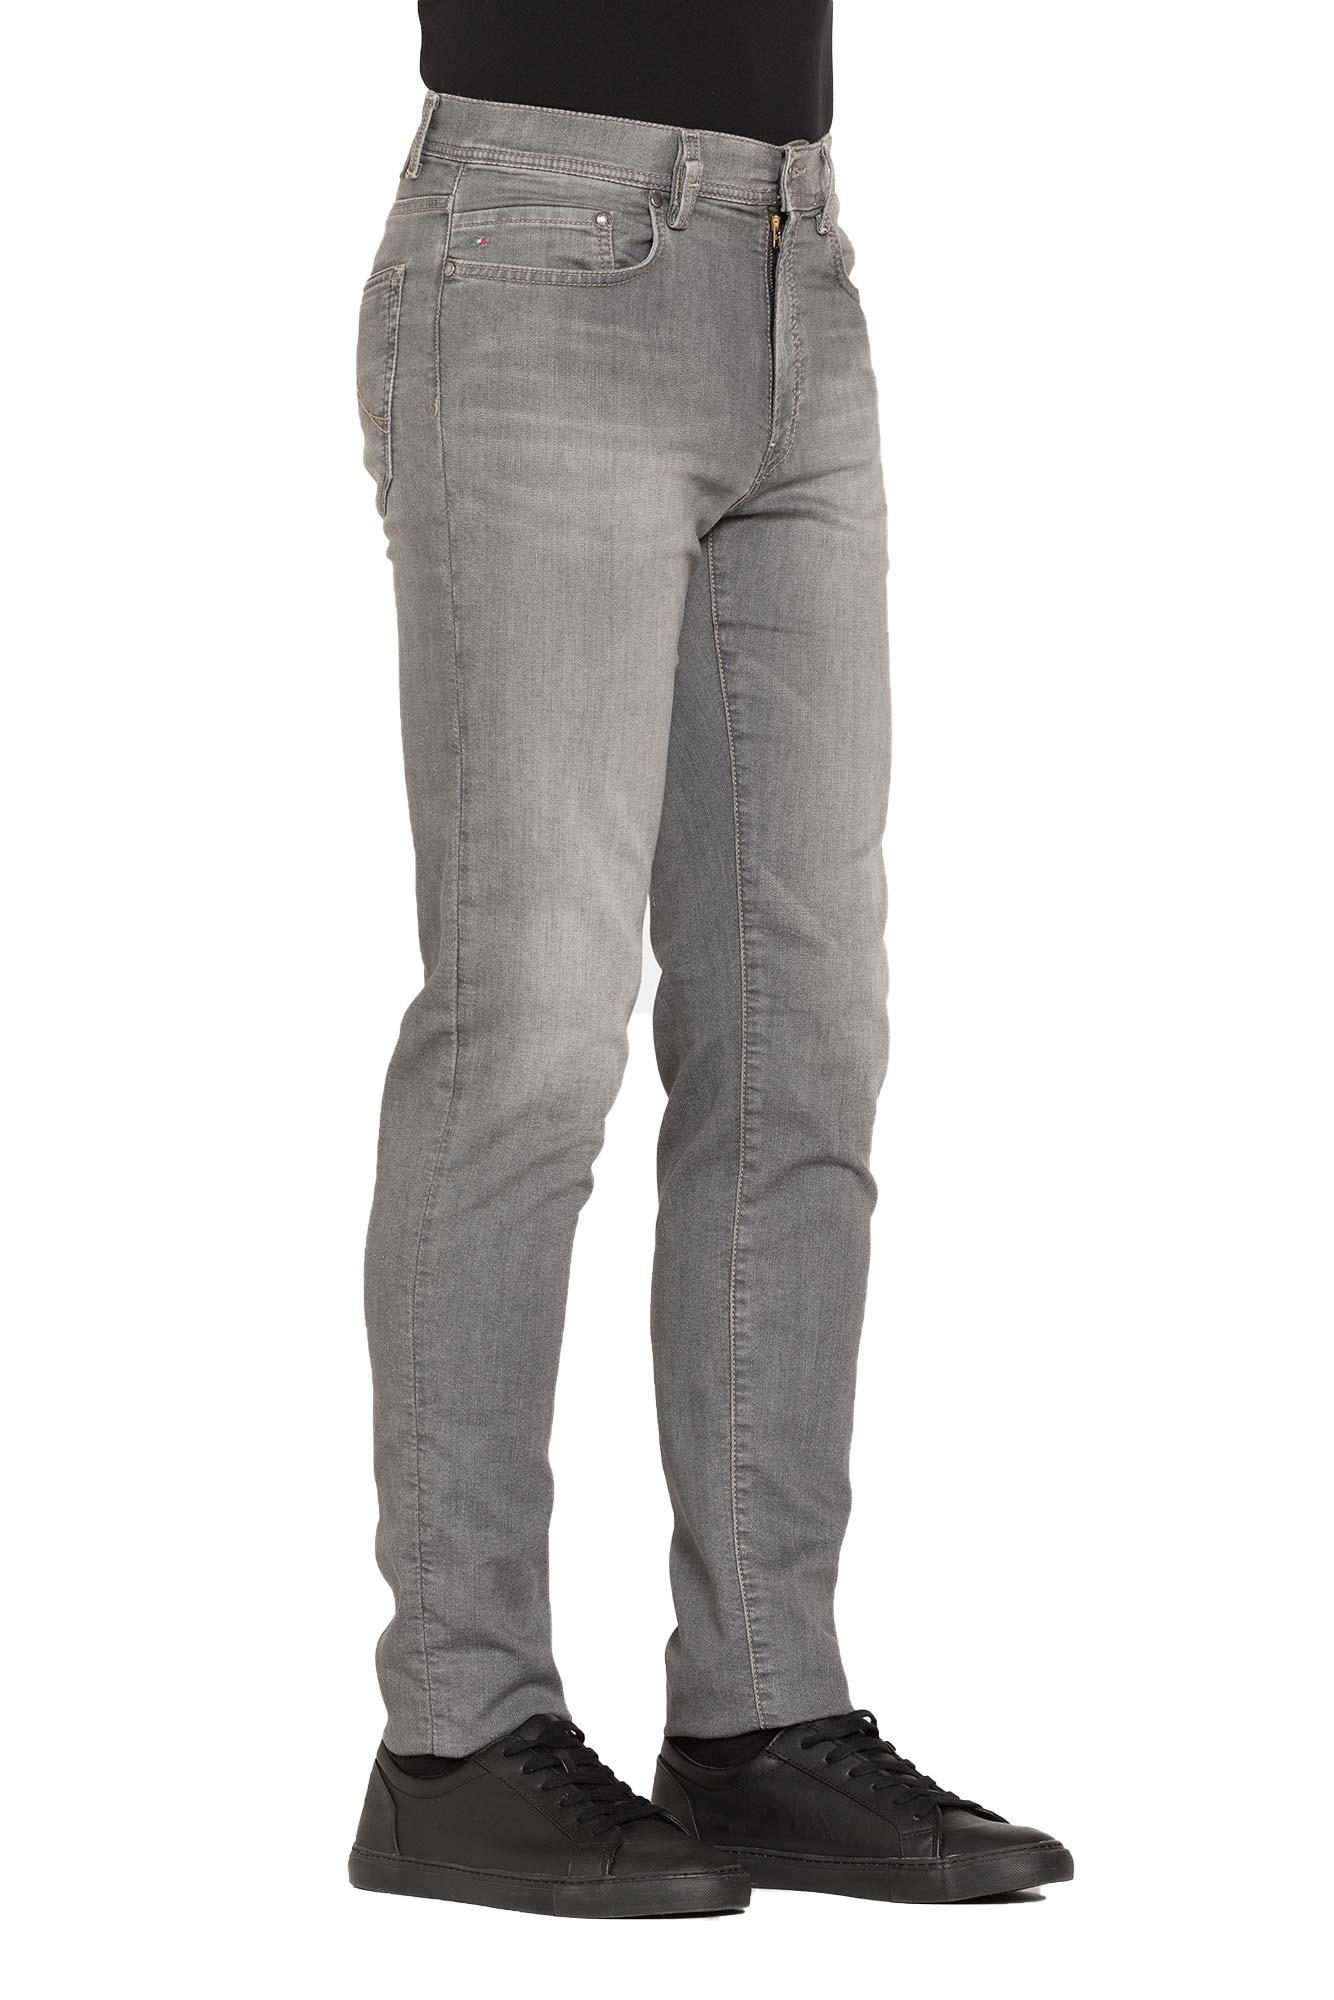 Carrera-Jeans-Jeans-per-uomo-tinta-unita miniatura 17